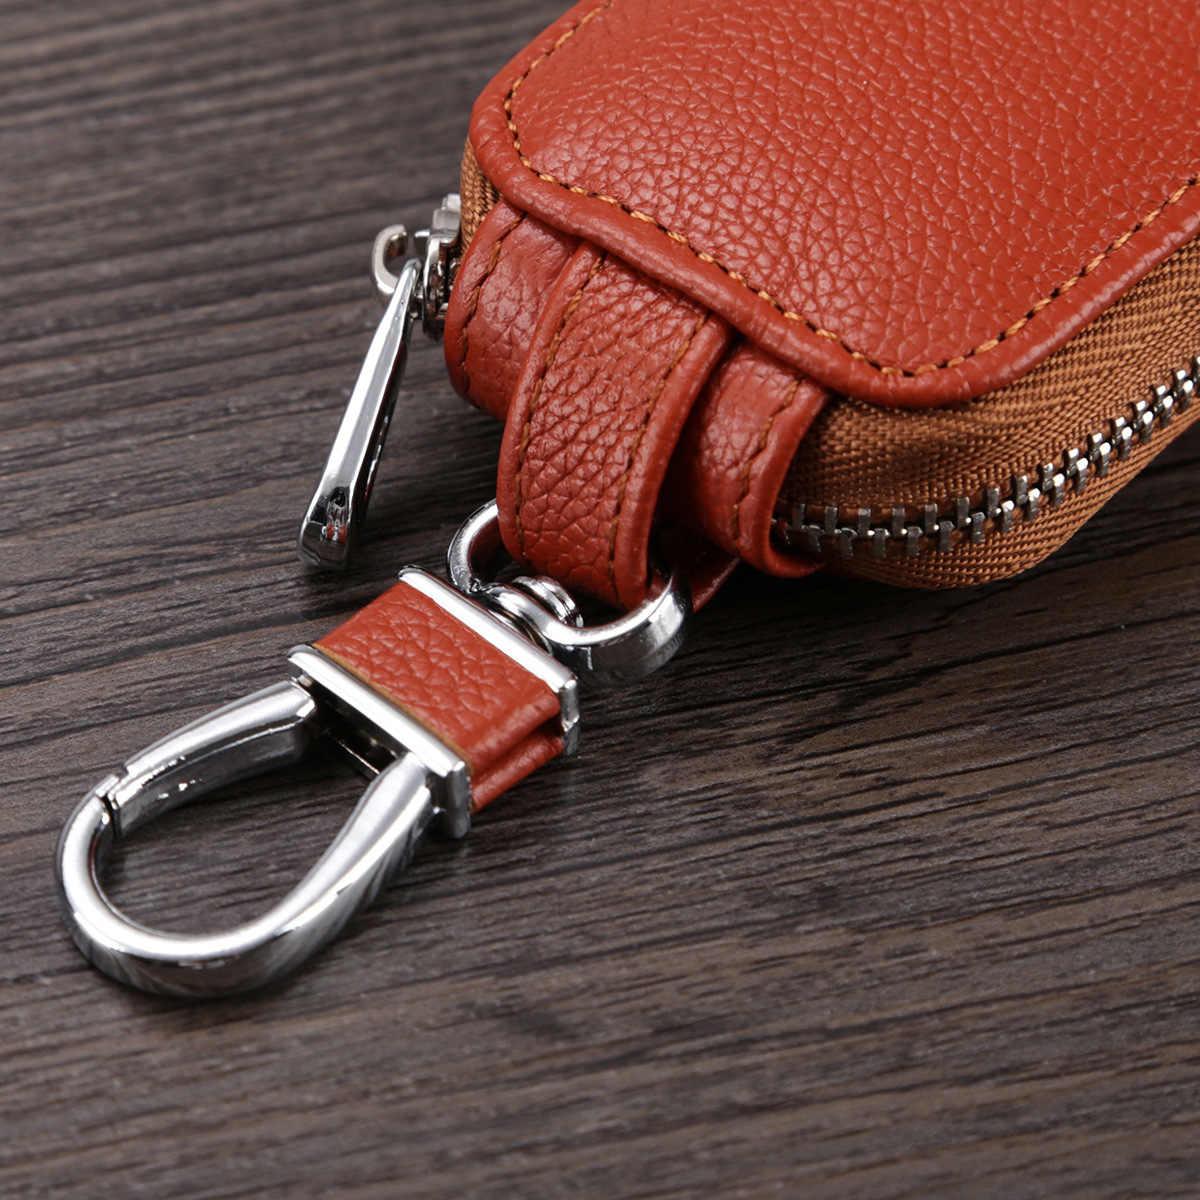 Key Pouch Mannen Autosleutel Case Cover Vrouwen Sleutelhouder Portemonnee Key Pocket Voor Mannelijke Vrouwelijke Echte Koe lederen Tas Key Organizer